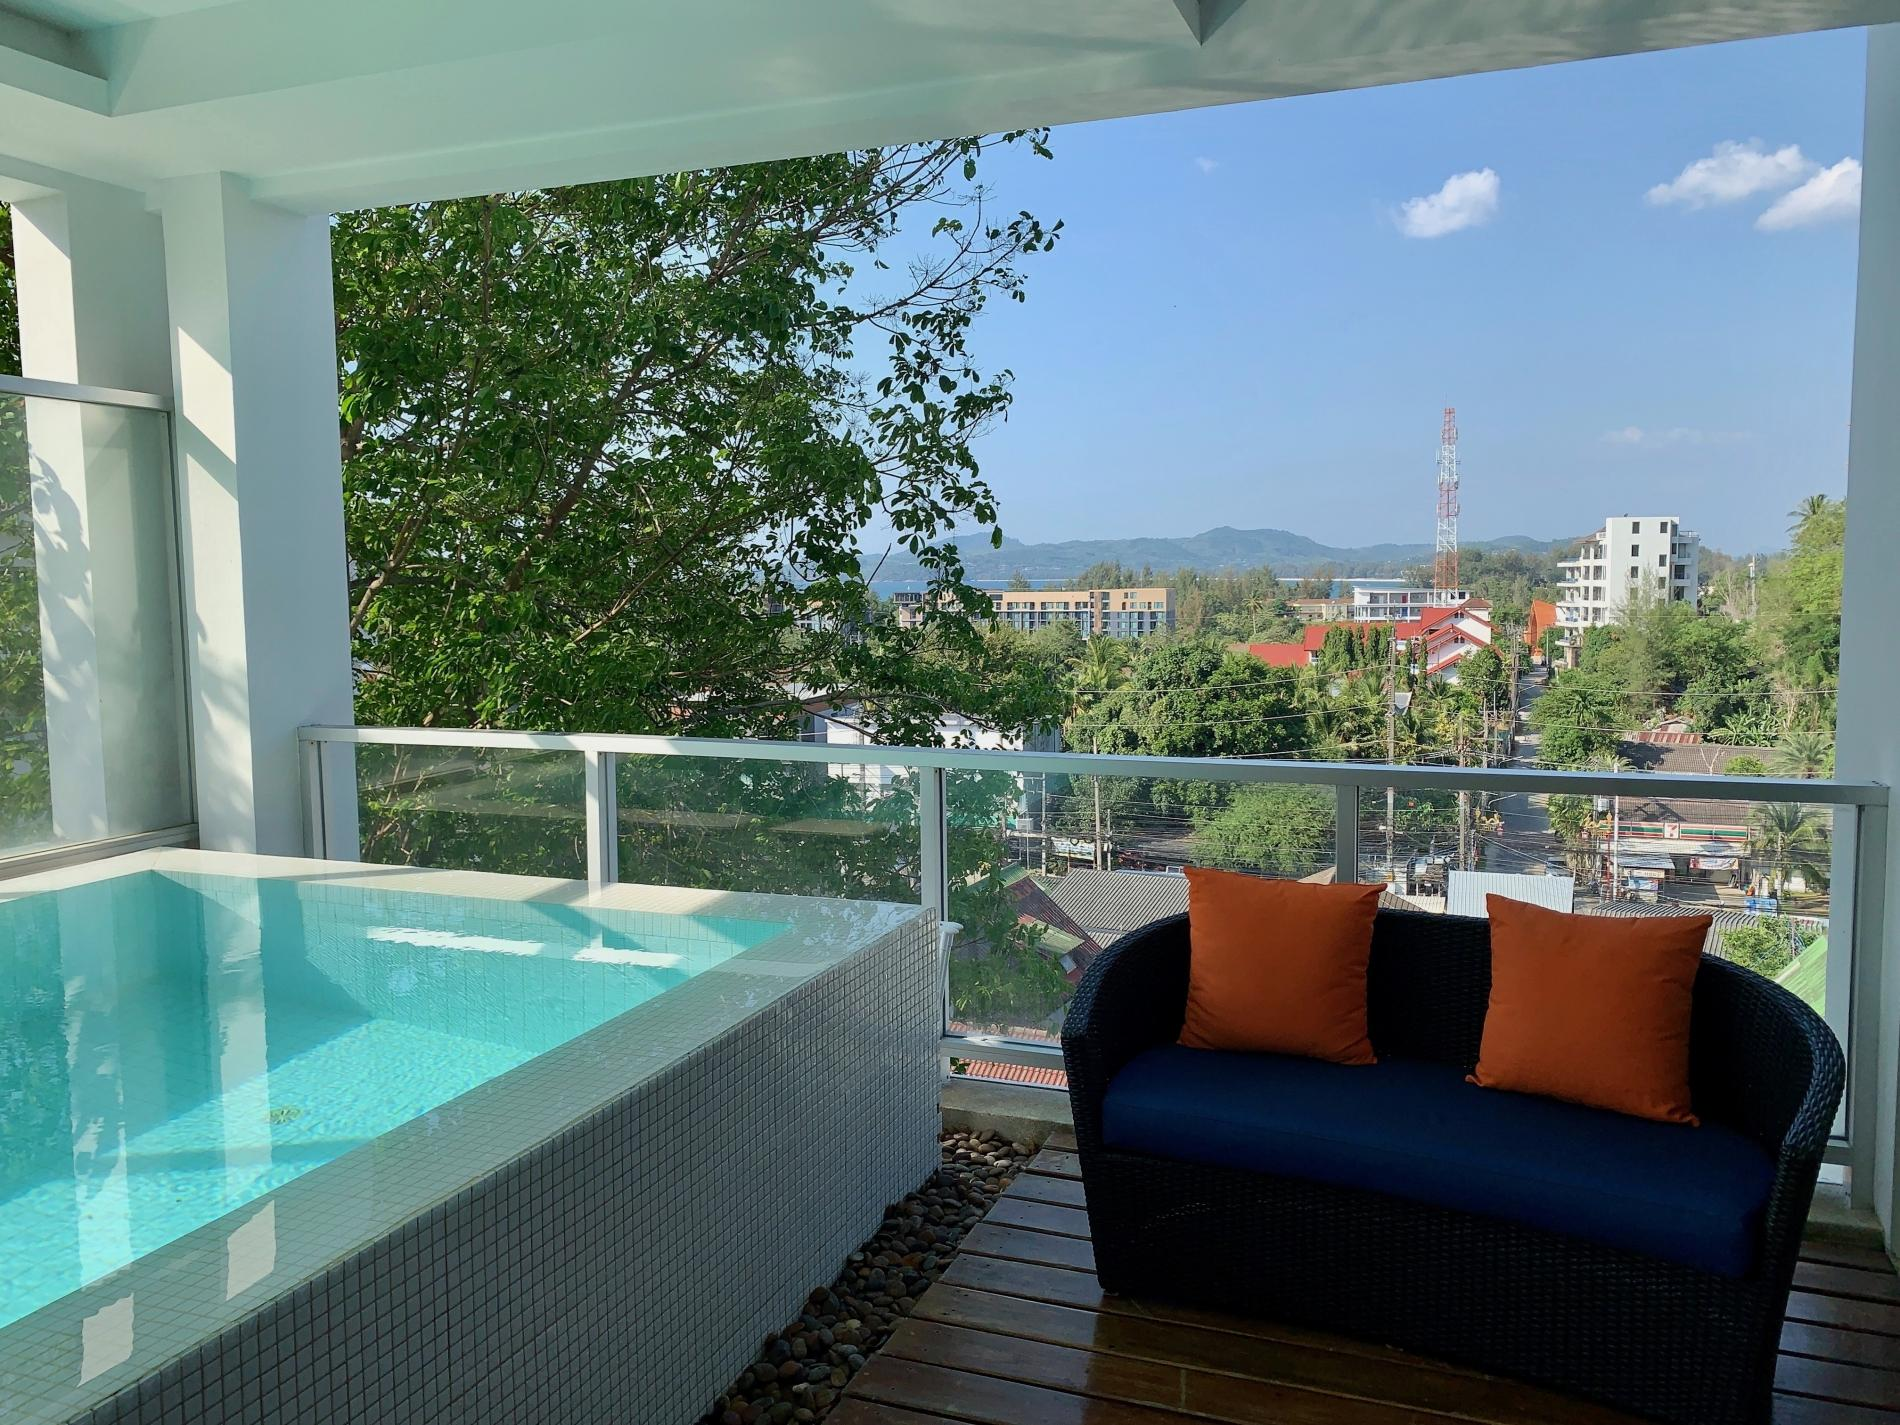 Apartment The Quarter 301 - Luxury Surin 3 bedroom apartment private pool photo 26108704